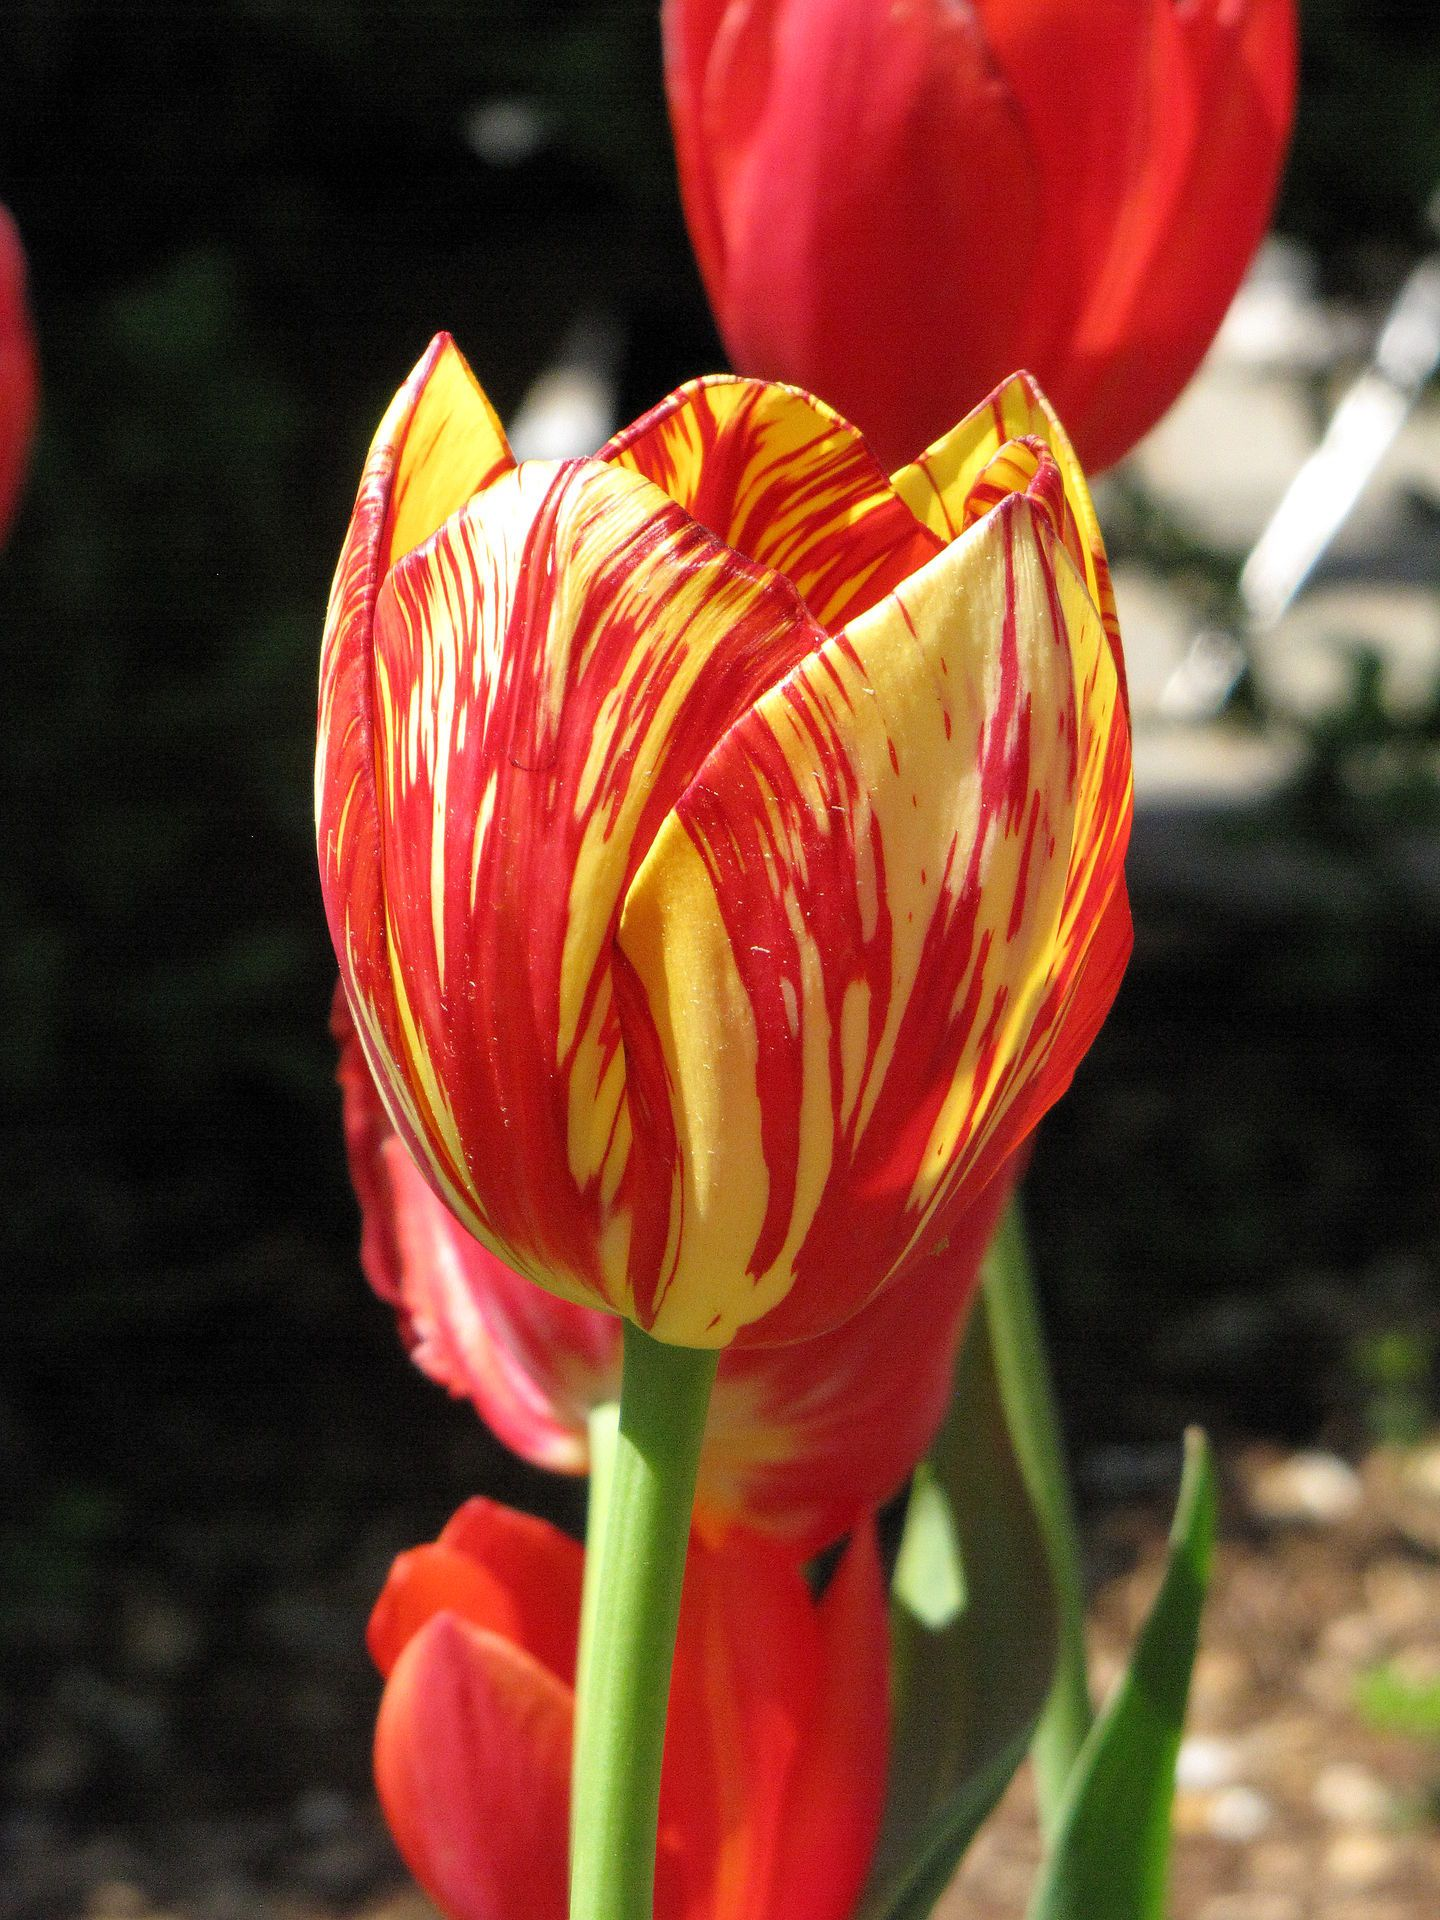 variegated colors produced by tulip breaking virus